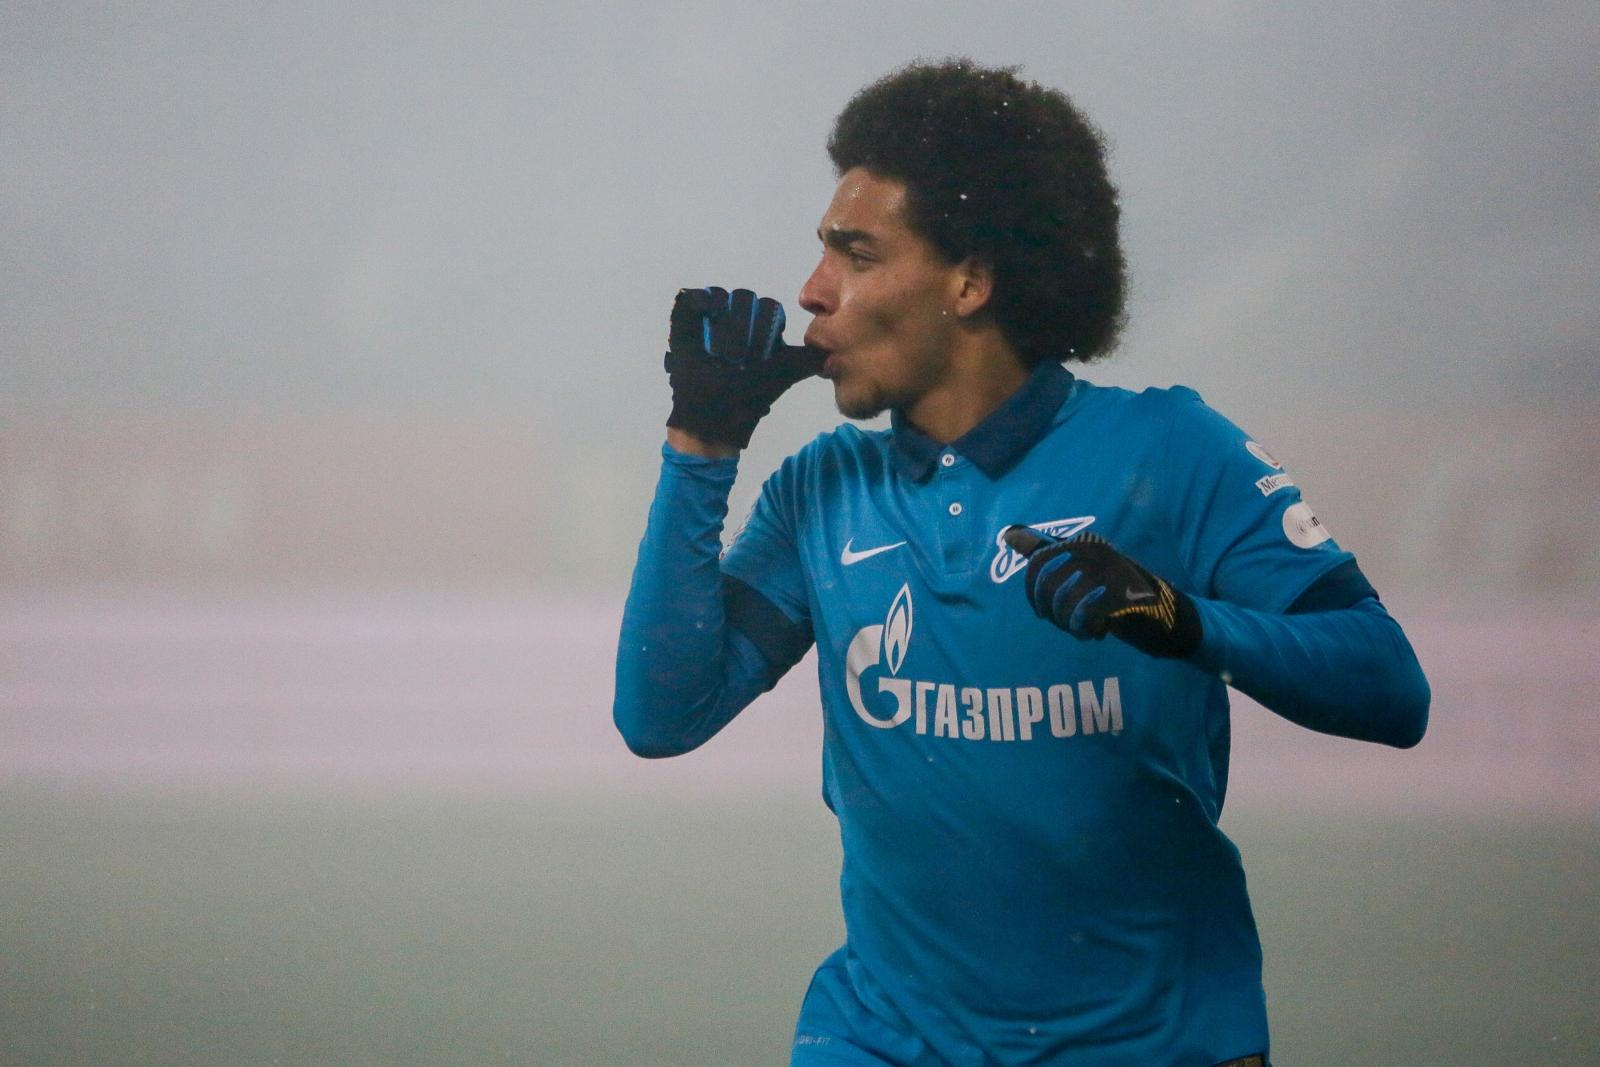 Zenit St Petersburg midfielder Axel Witsel reveals his admiration for Manchester United